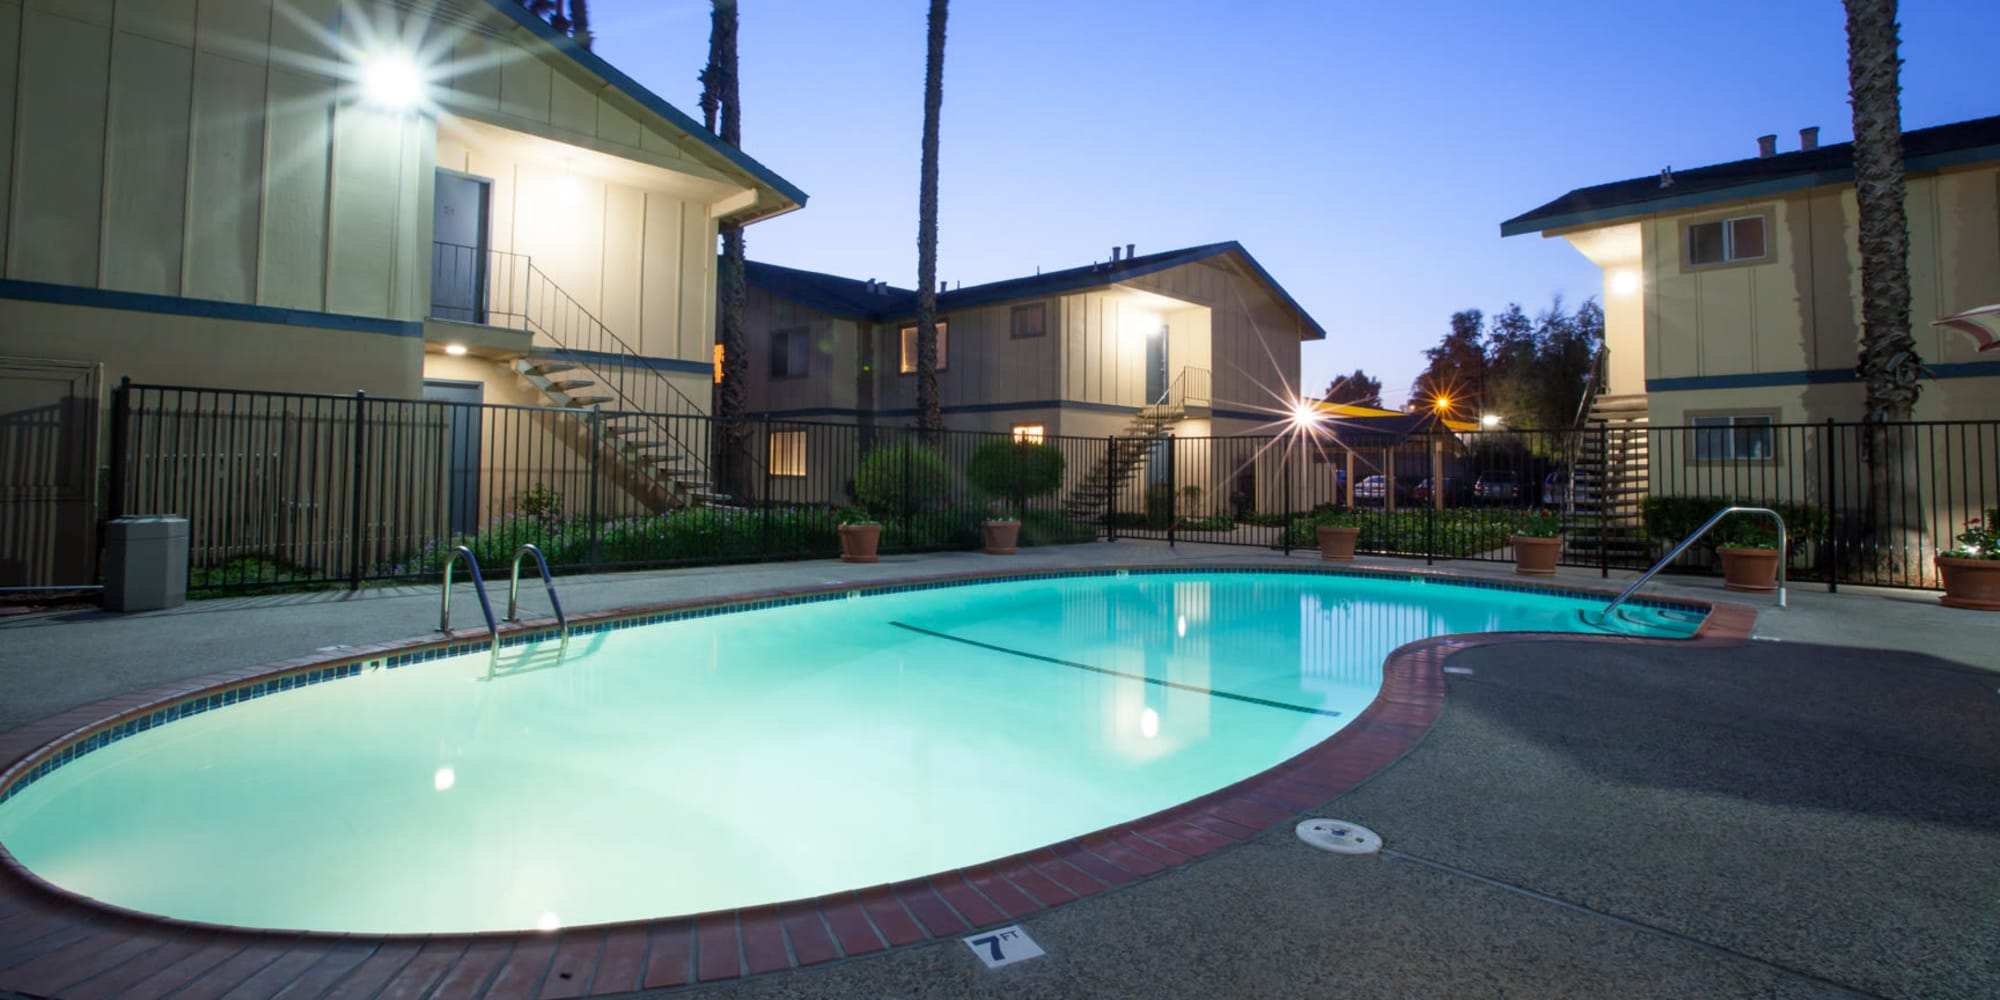 Cedartree Apartments in Santa Clara, California